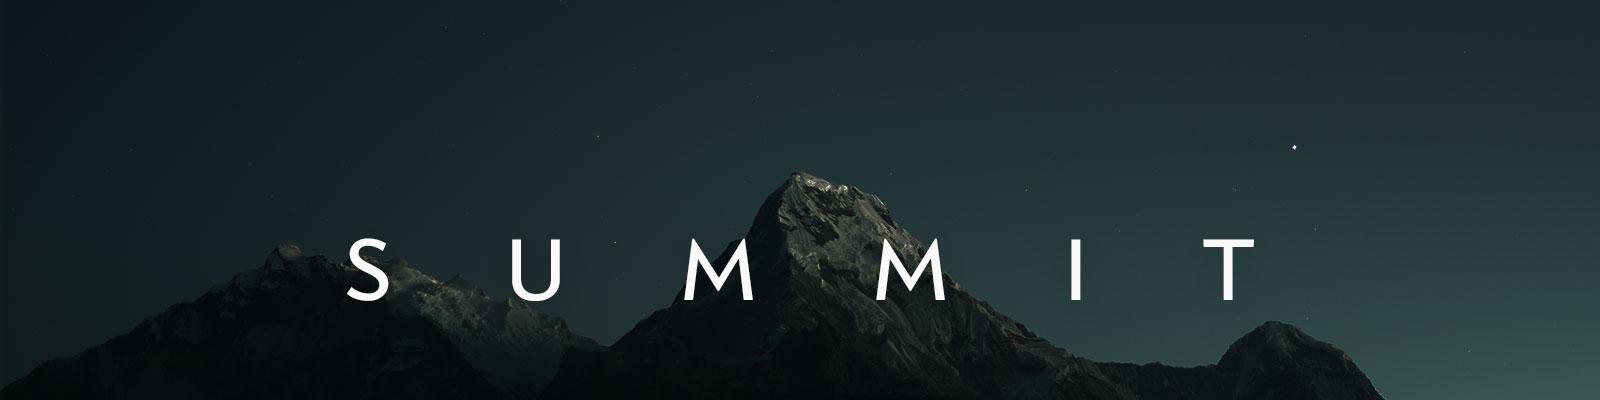 The-Summit-1600x400px.jpg